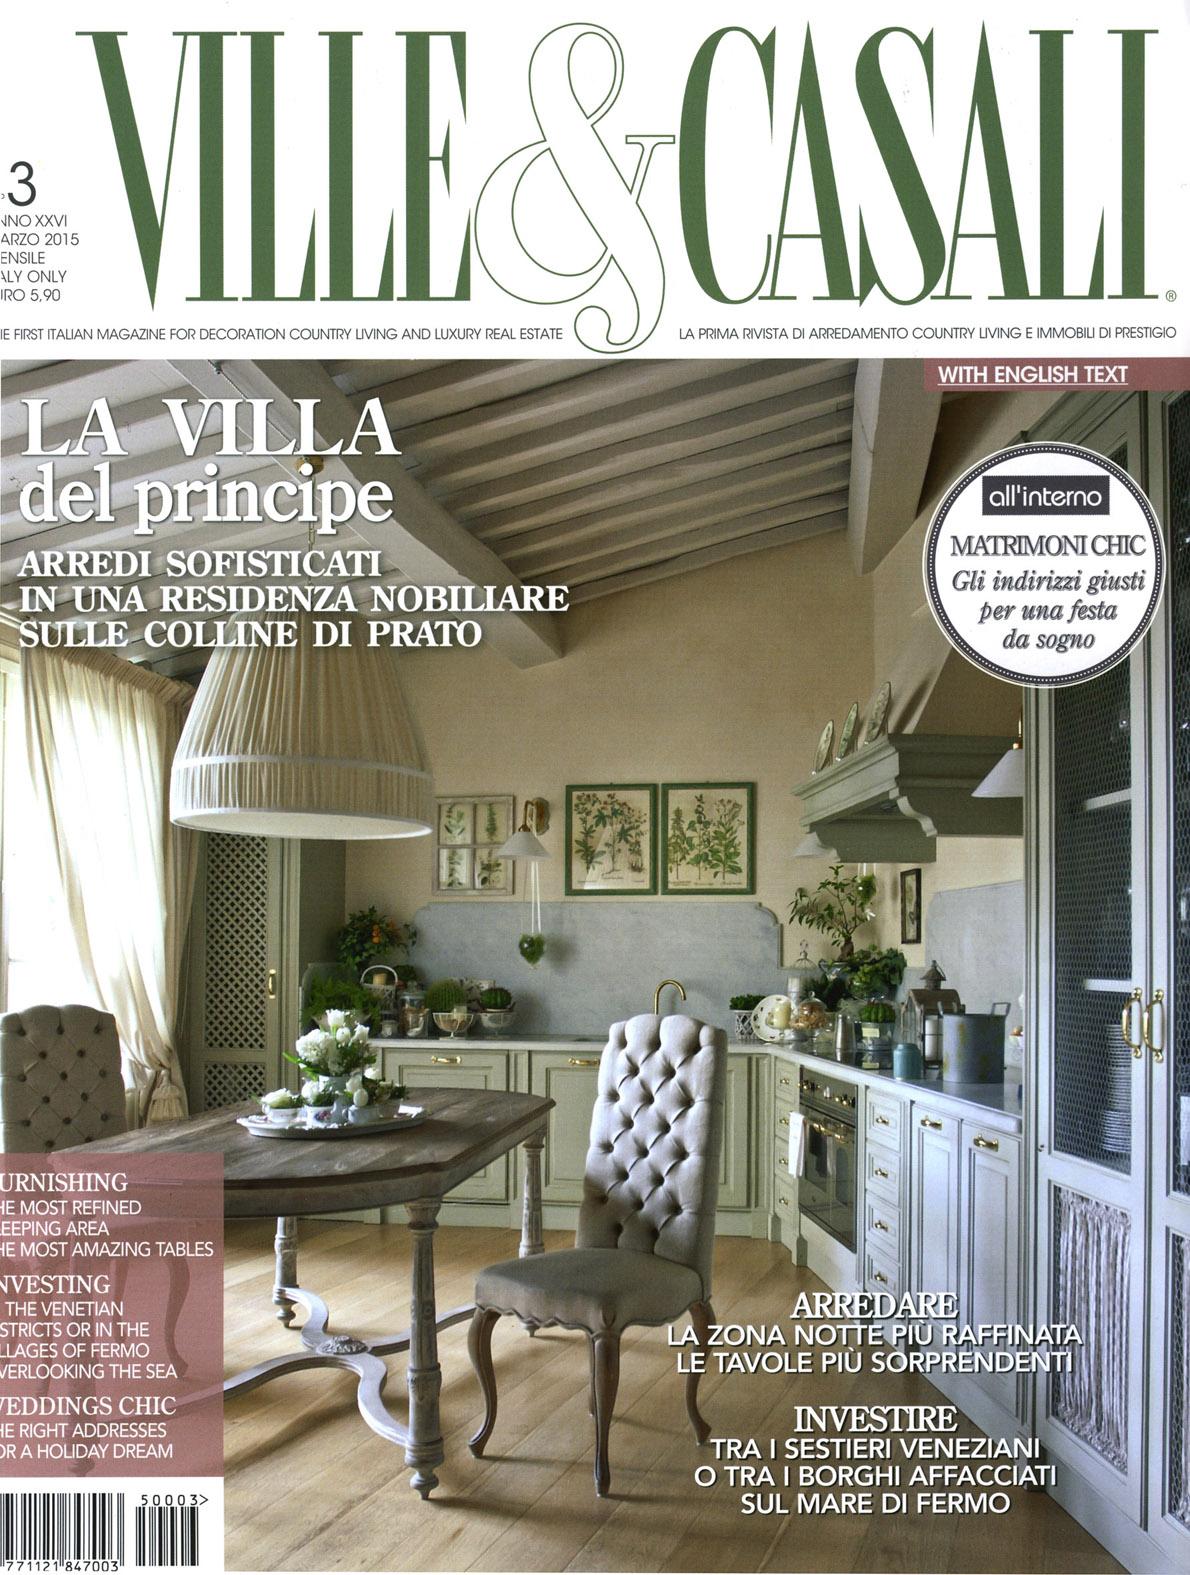 Arredamento Per Casali wooden parquet flooring decoration&design magazines march